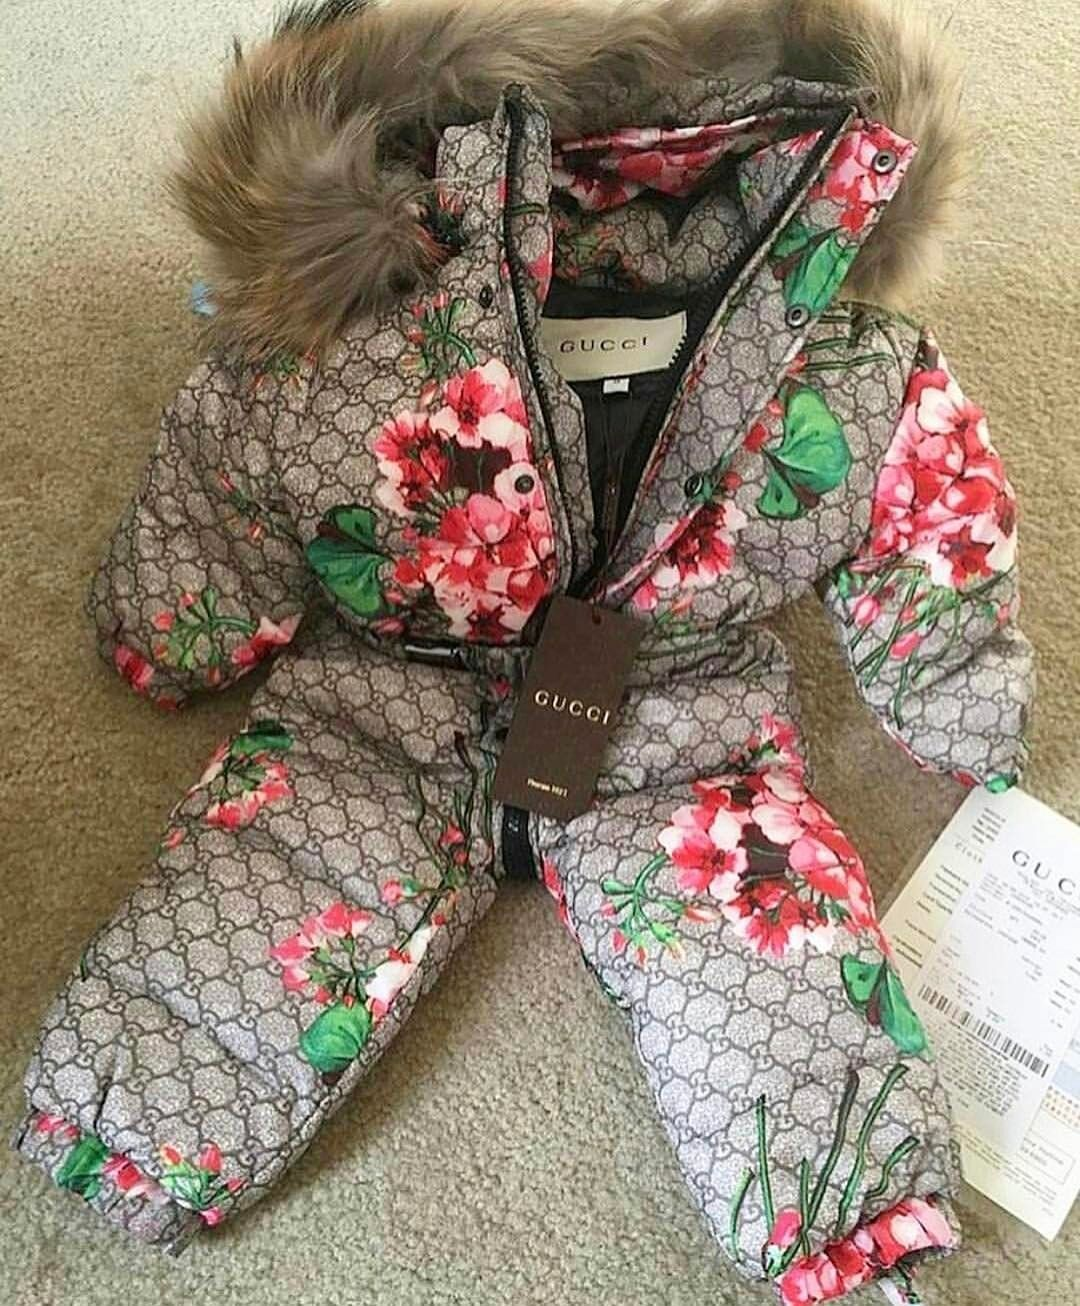 8c4abc6de baby Gucci. x | ♕ ℱσя ℳу ℱυтυяє ℬαвιє'ѕ ♕ | Baby kids clothes ...